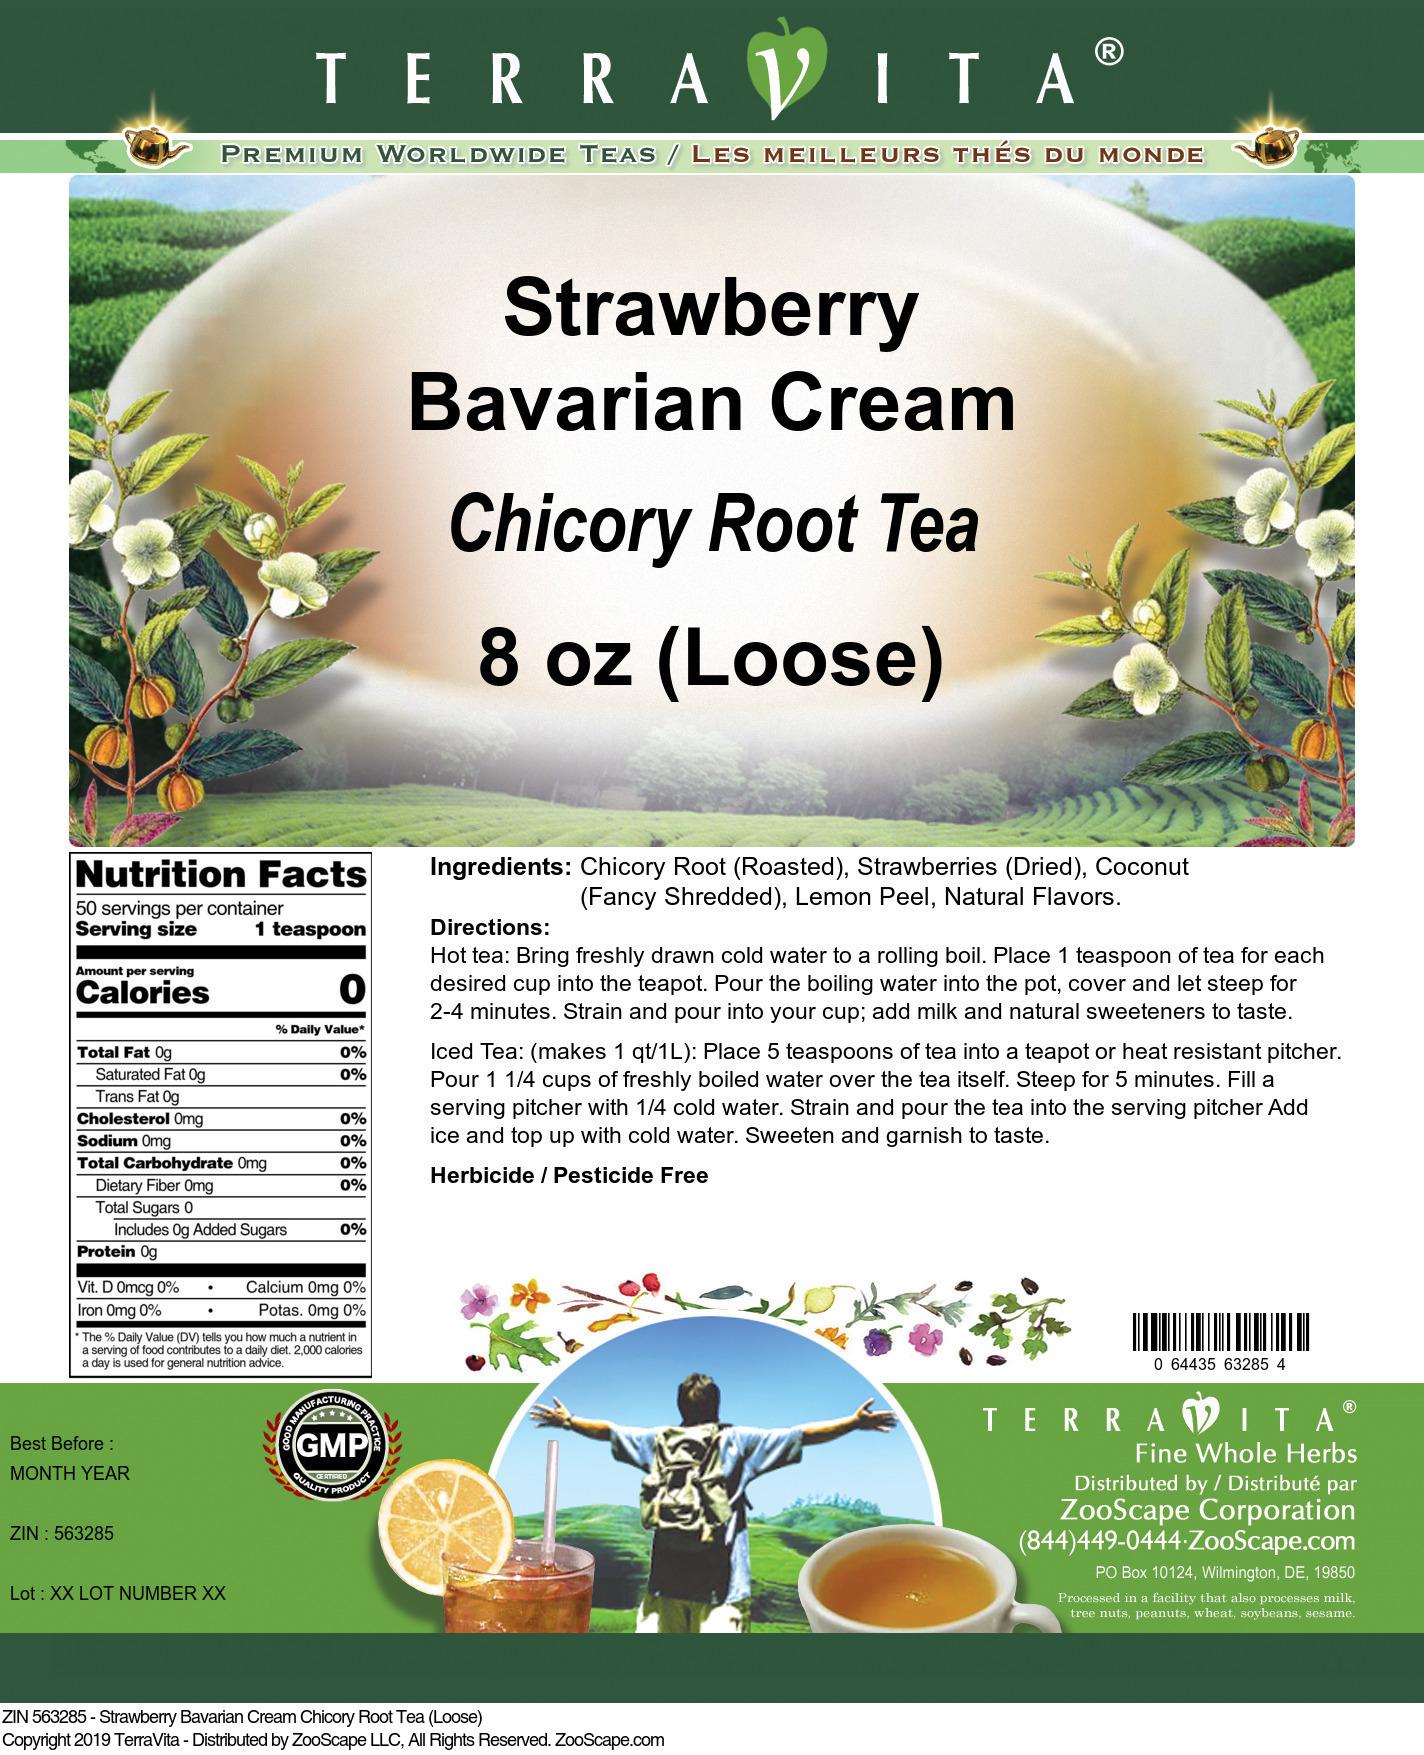 Strawberry Bavarian Cream Chicory Root Tea (Loose)